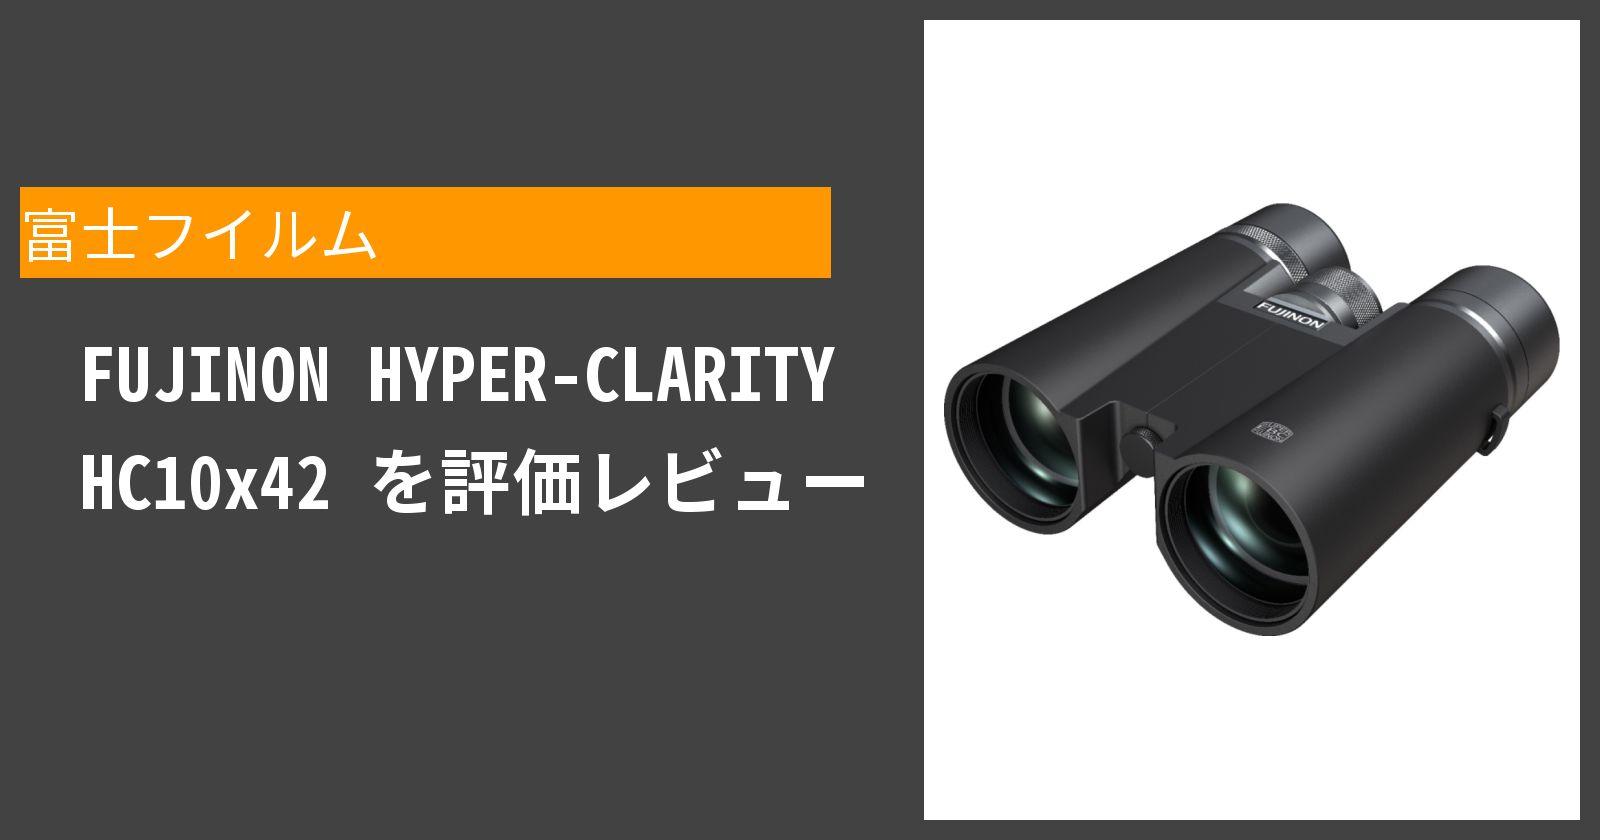 FUJINON HYPER-CLARITY HC10x42を徹底評価